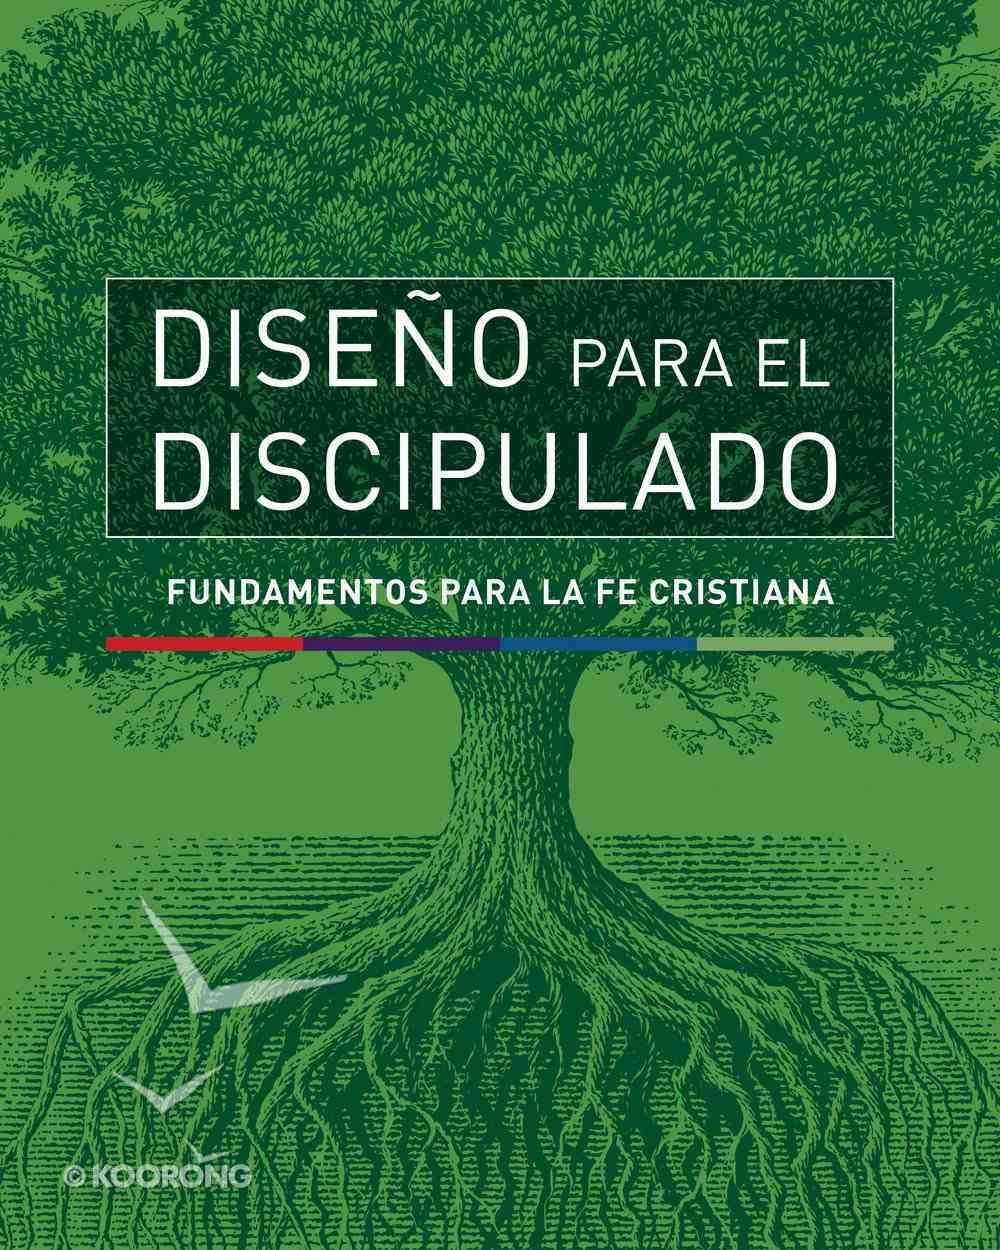 Diseno Para El Discipulado: Fundamentos Para La Fe Cristiana (Design For Discipleship Series) Paperback